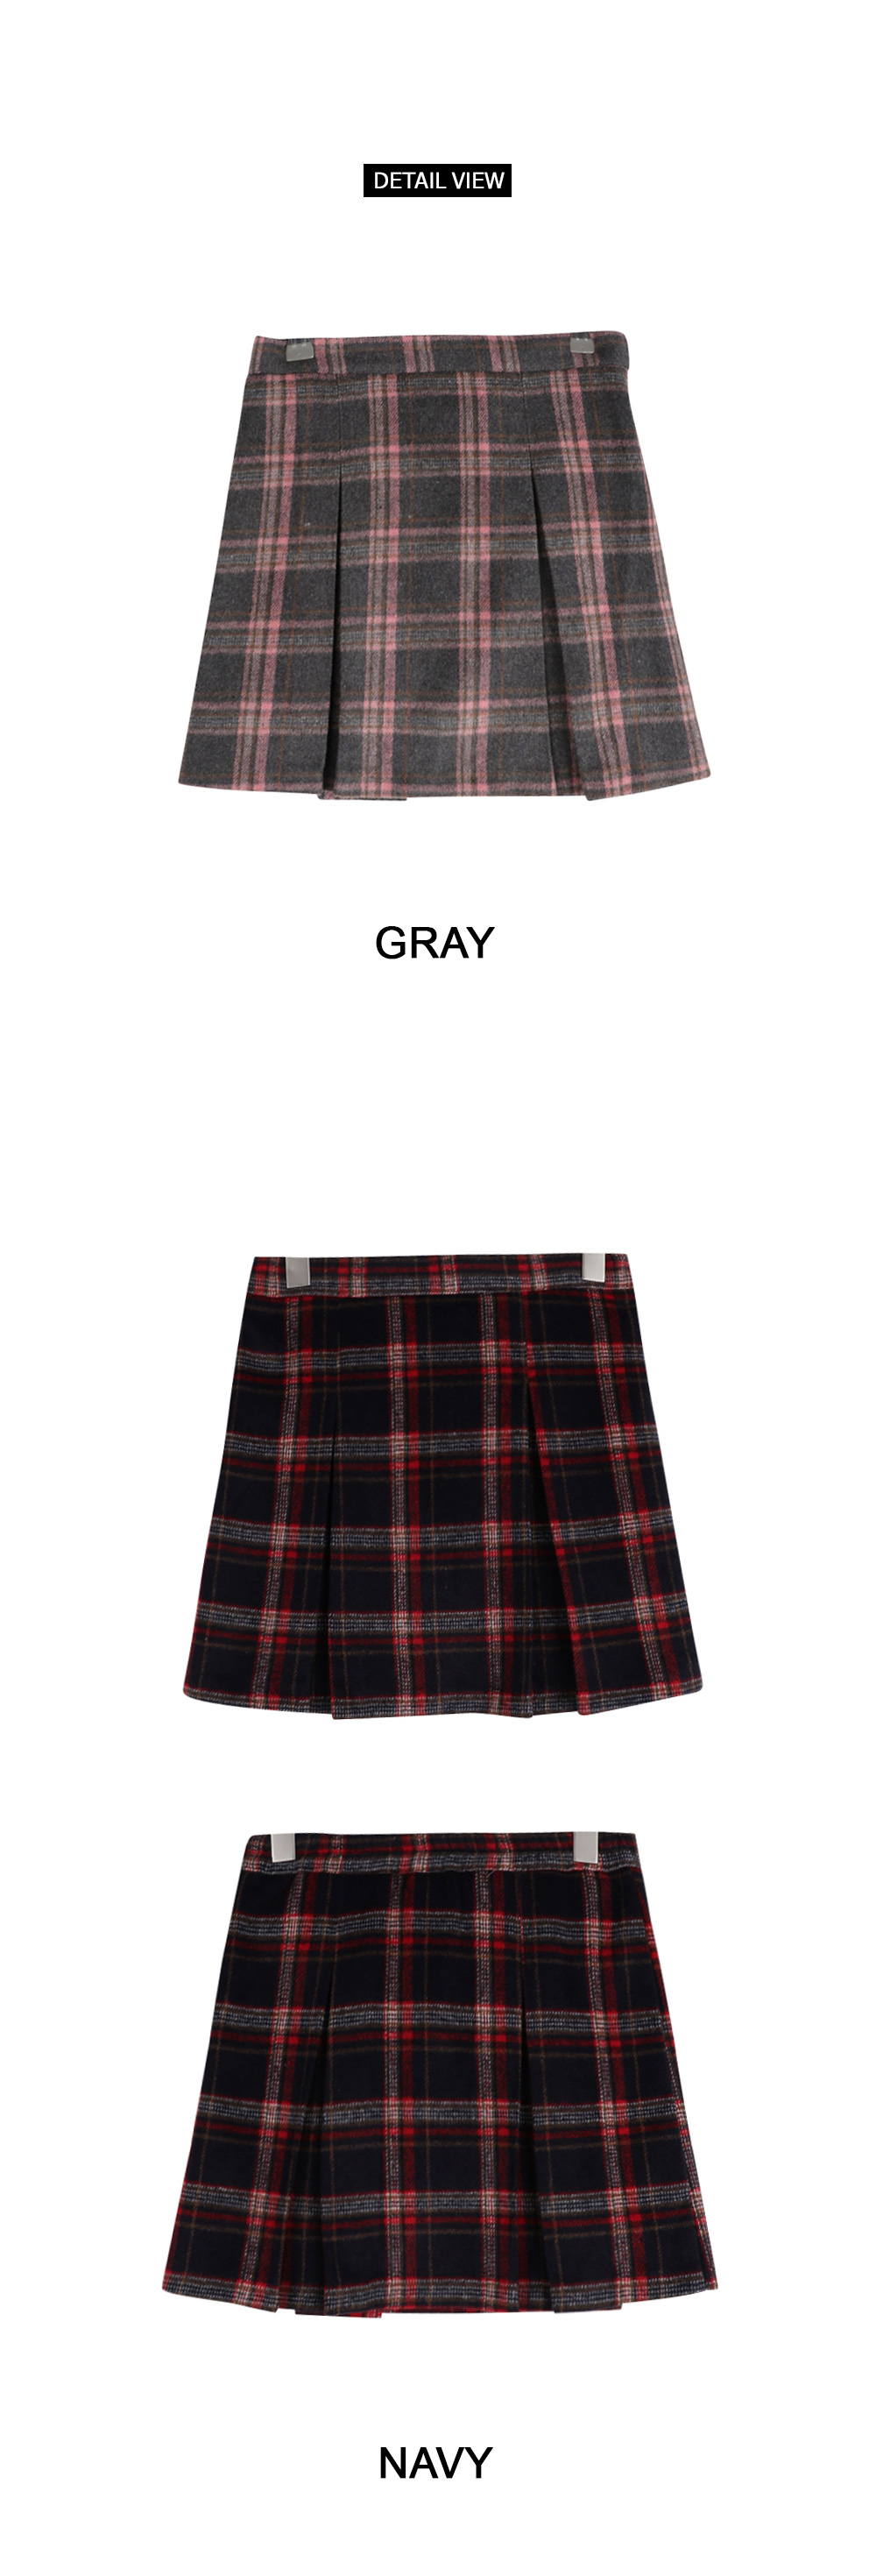 Cherry London pleated check skirt